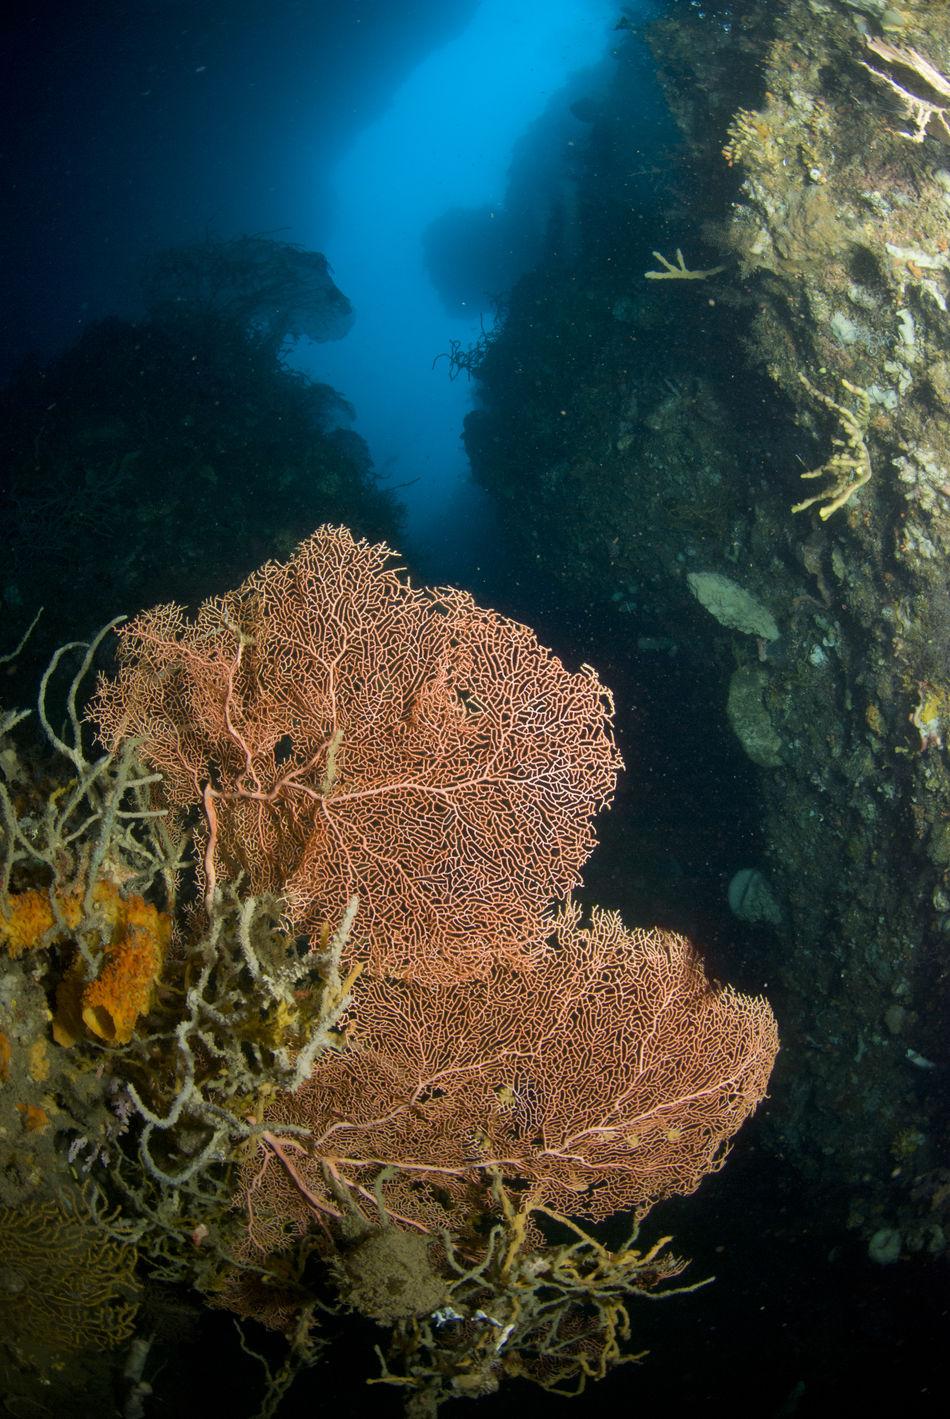 Beauty In Nature Close-up Coral Deepfreeze Multi Colored Nature No People Sea Fan Sea Life UnderSea Underwater